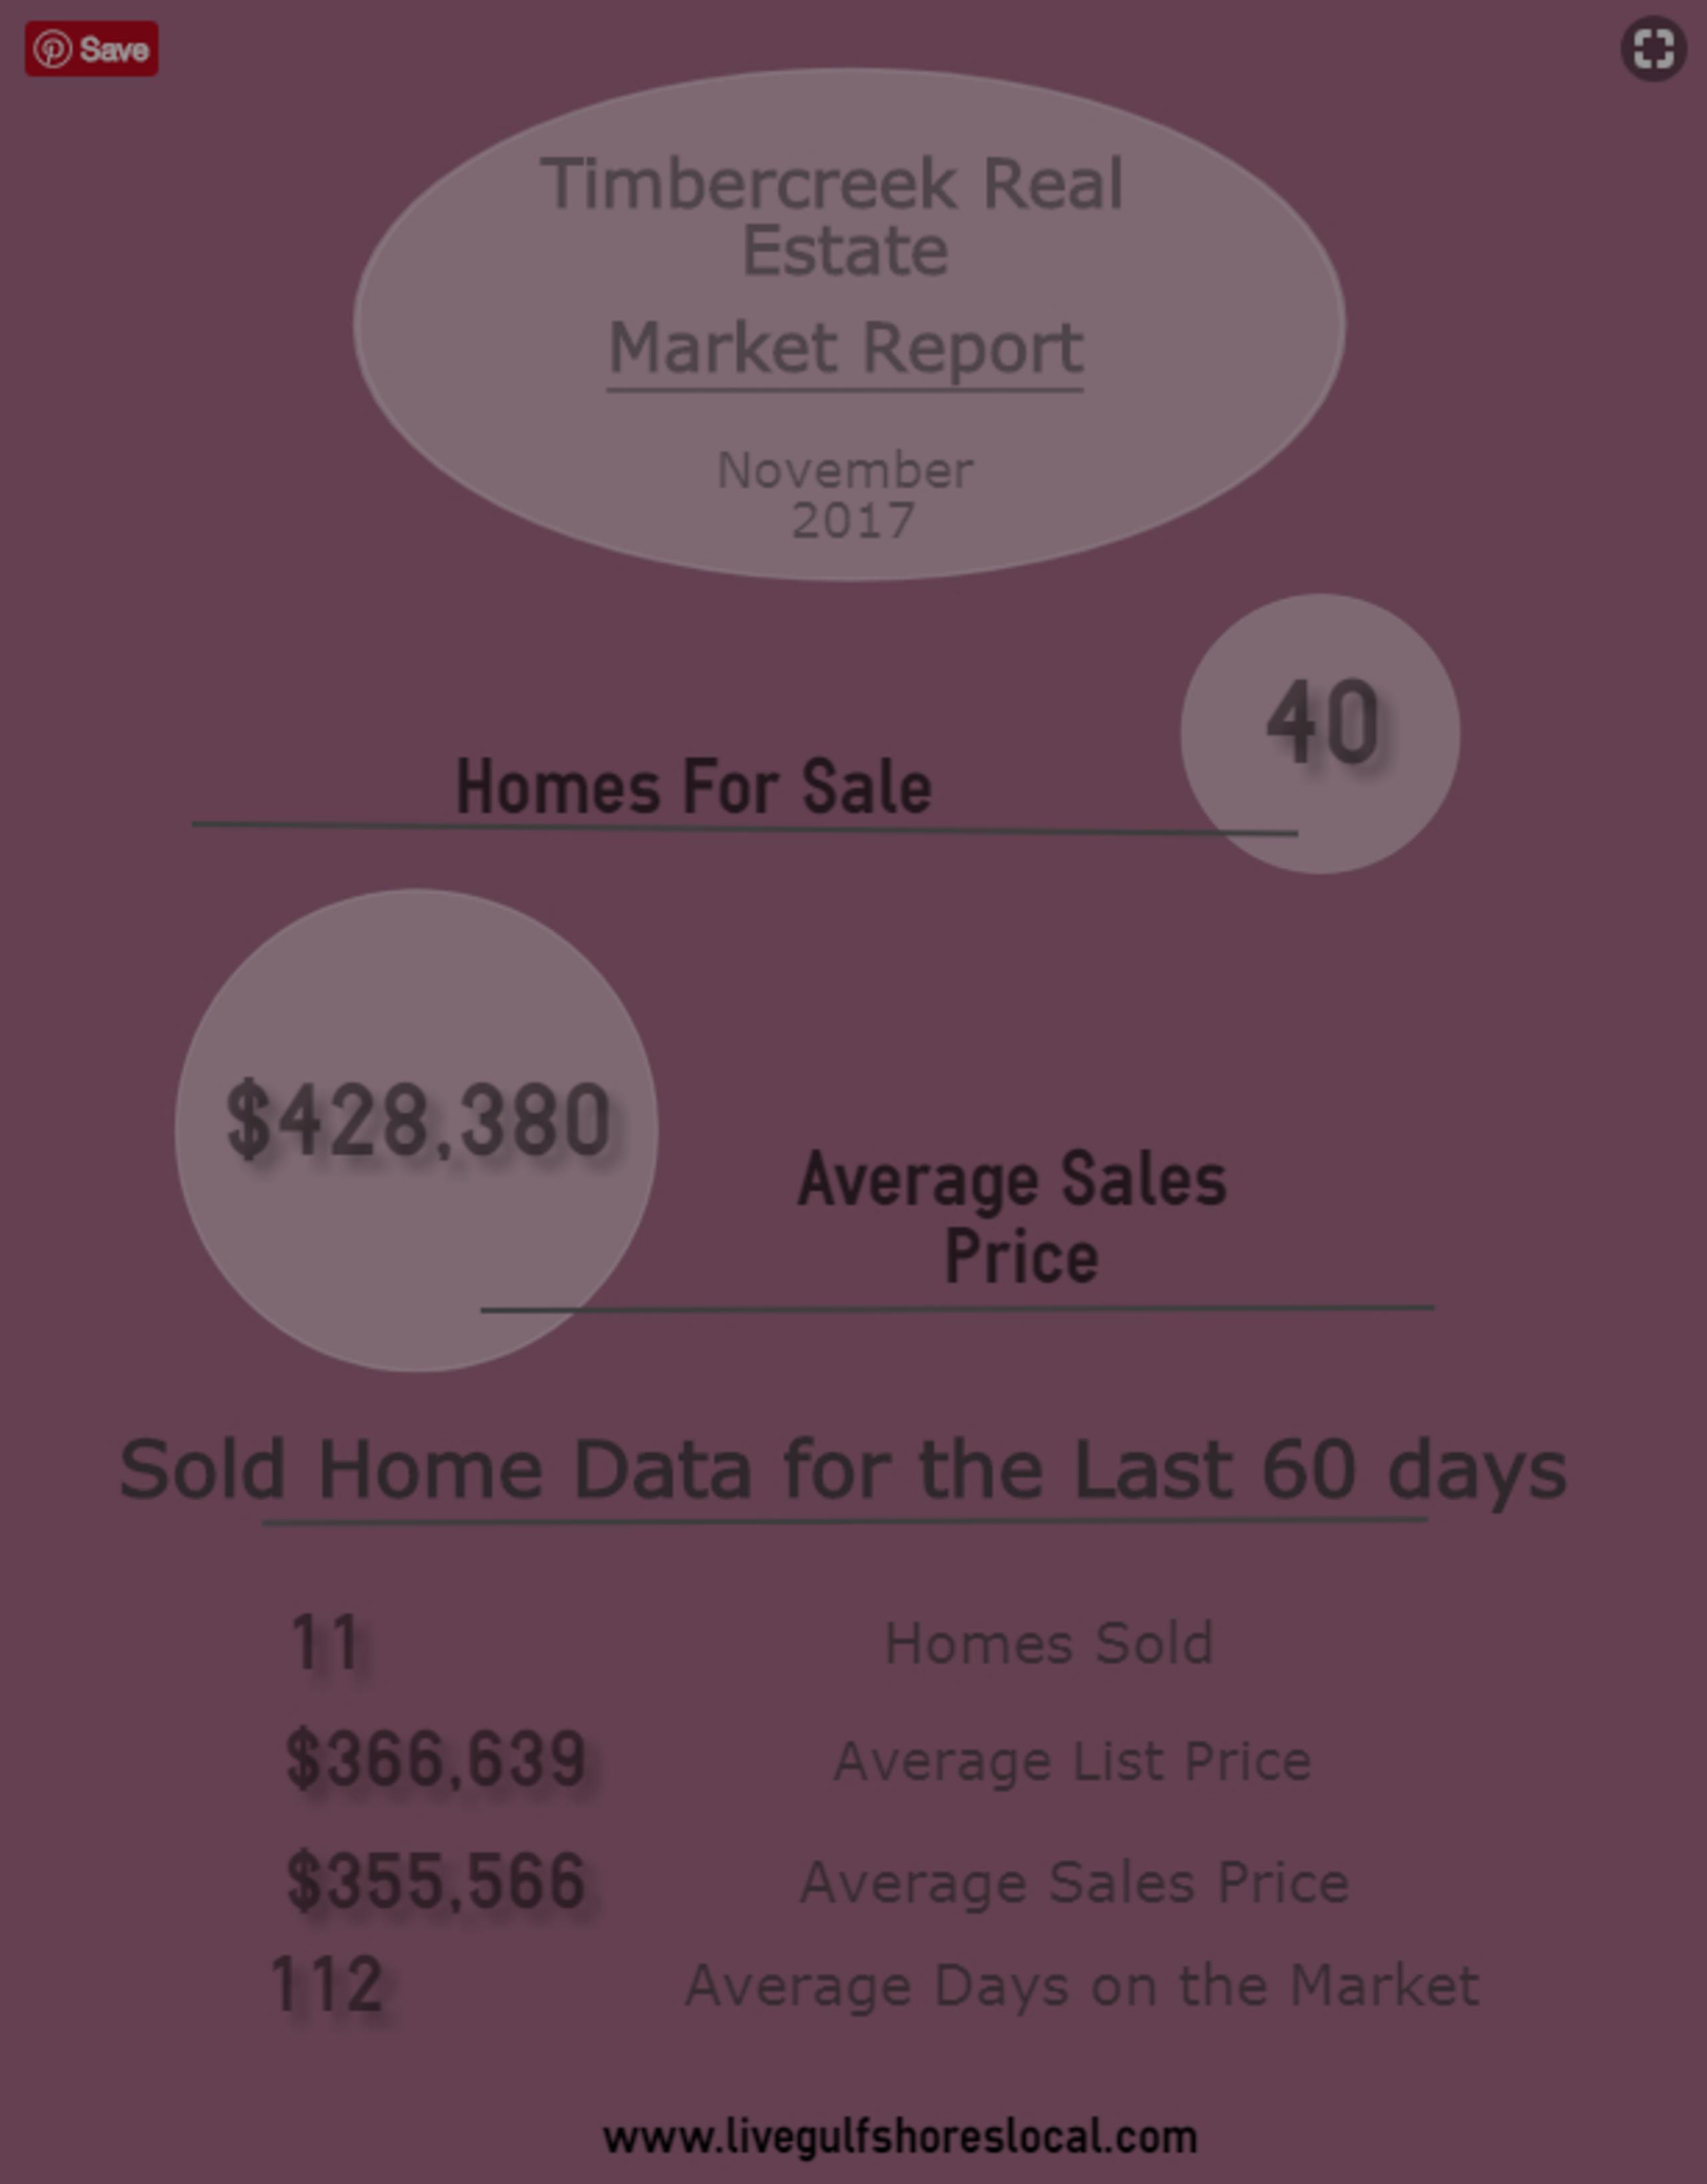 Timbercreek Real Estate Market Update – Nov 2017